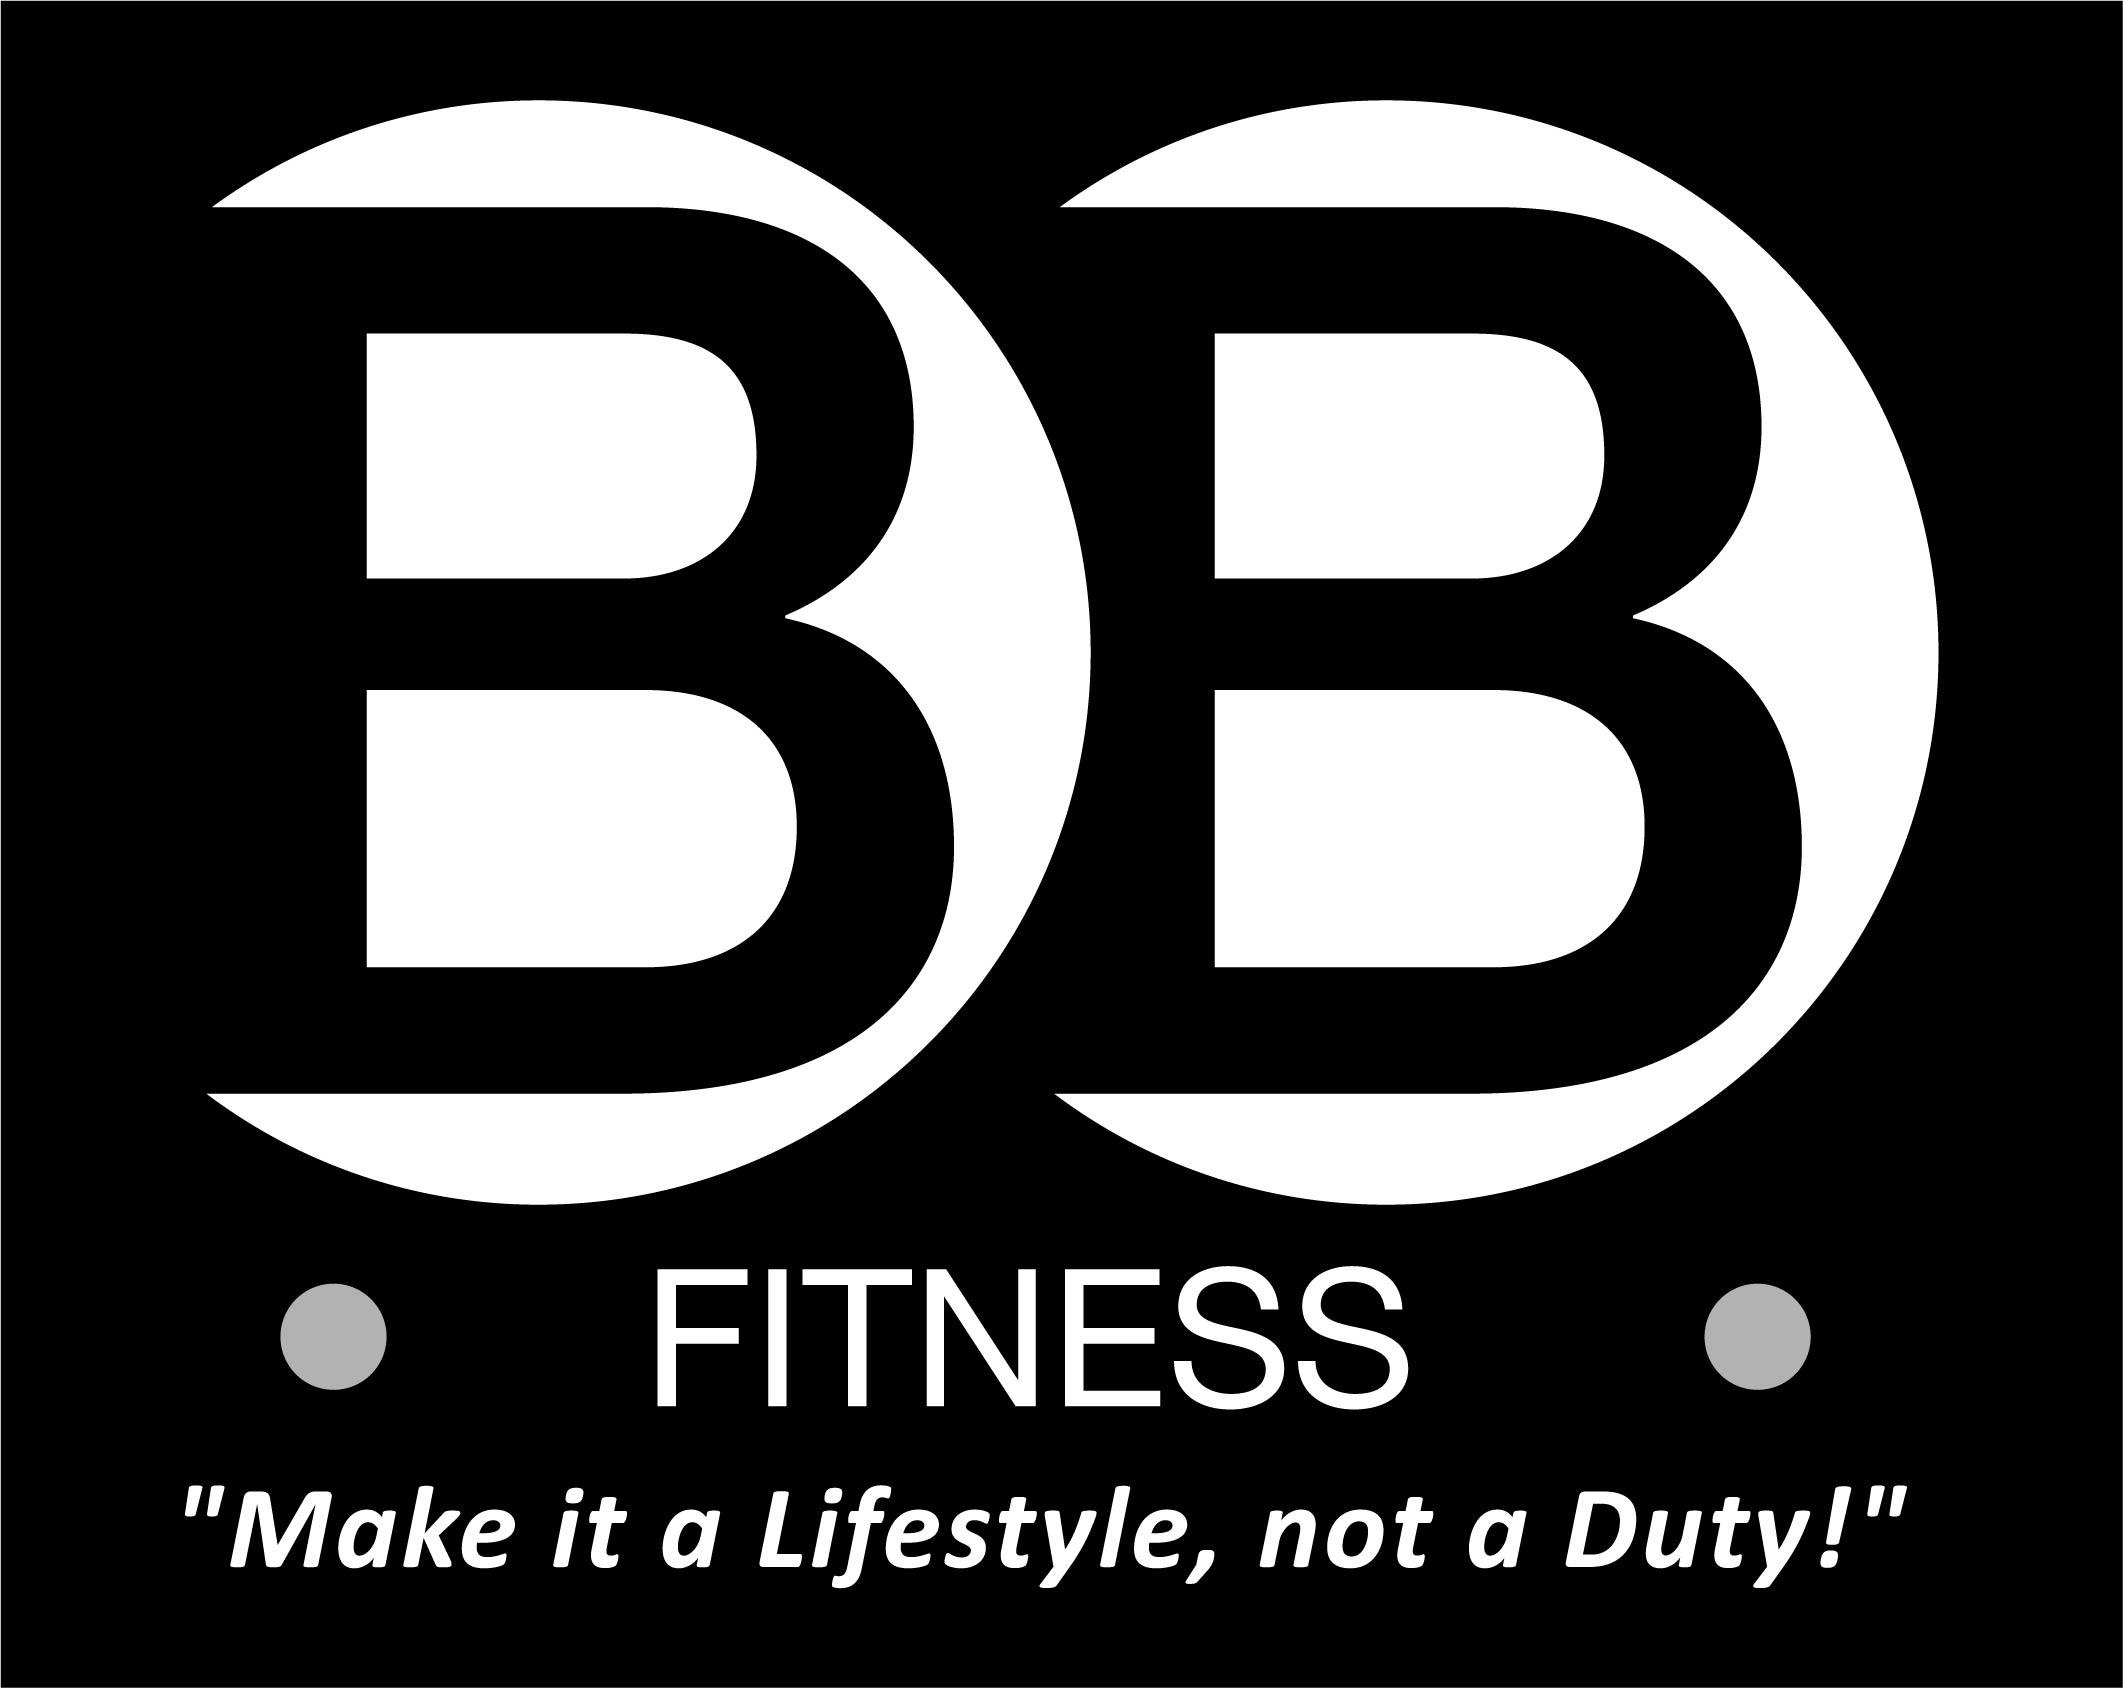 BB Fitness